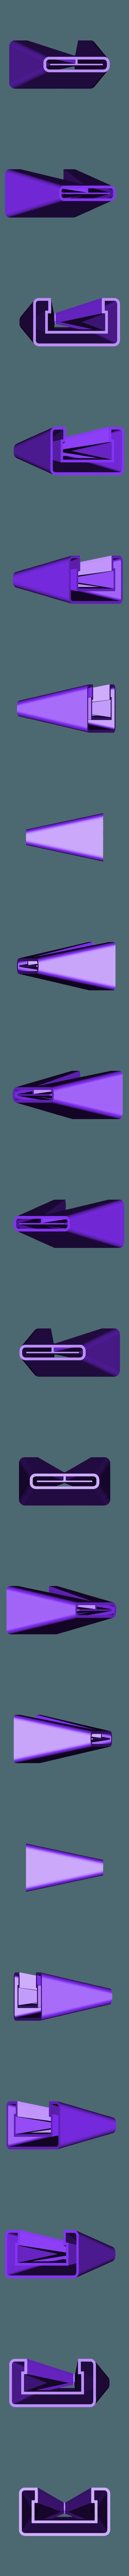 4cmBiasTape_Q2.stl Download free STL file 3cm / 3.5cm / 4cm / 5cm Simple Bias Tape Maker, zakladac pasku • 3D printable template, ongaroo